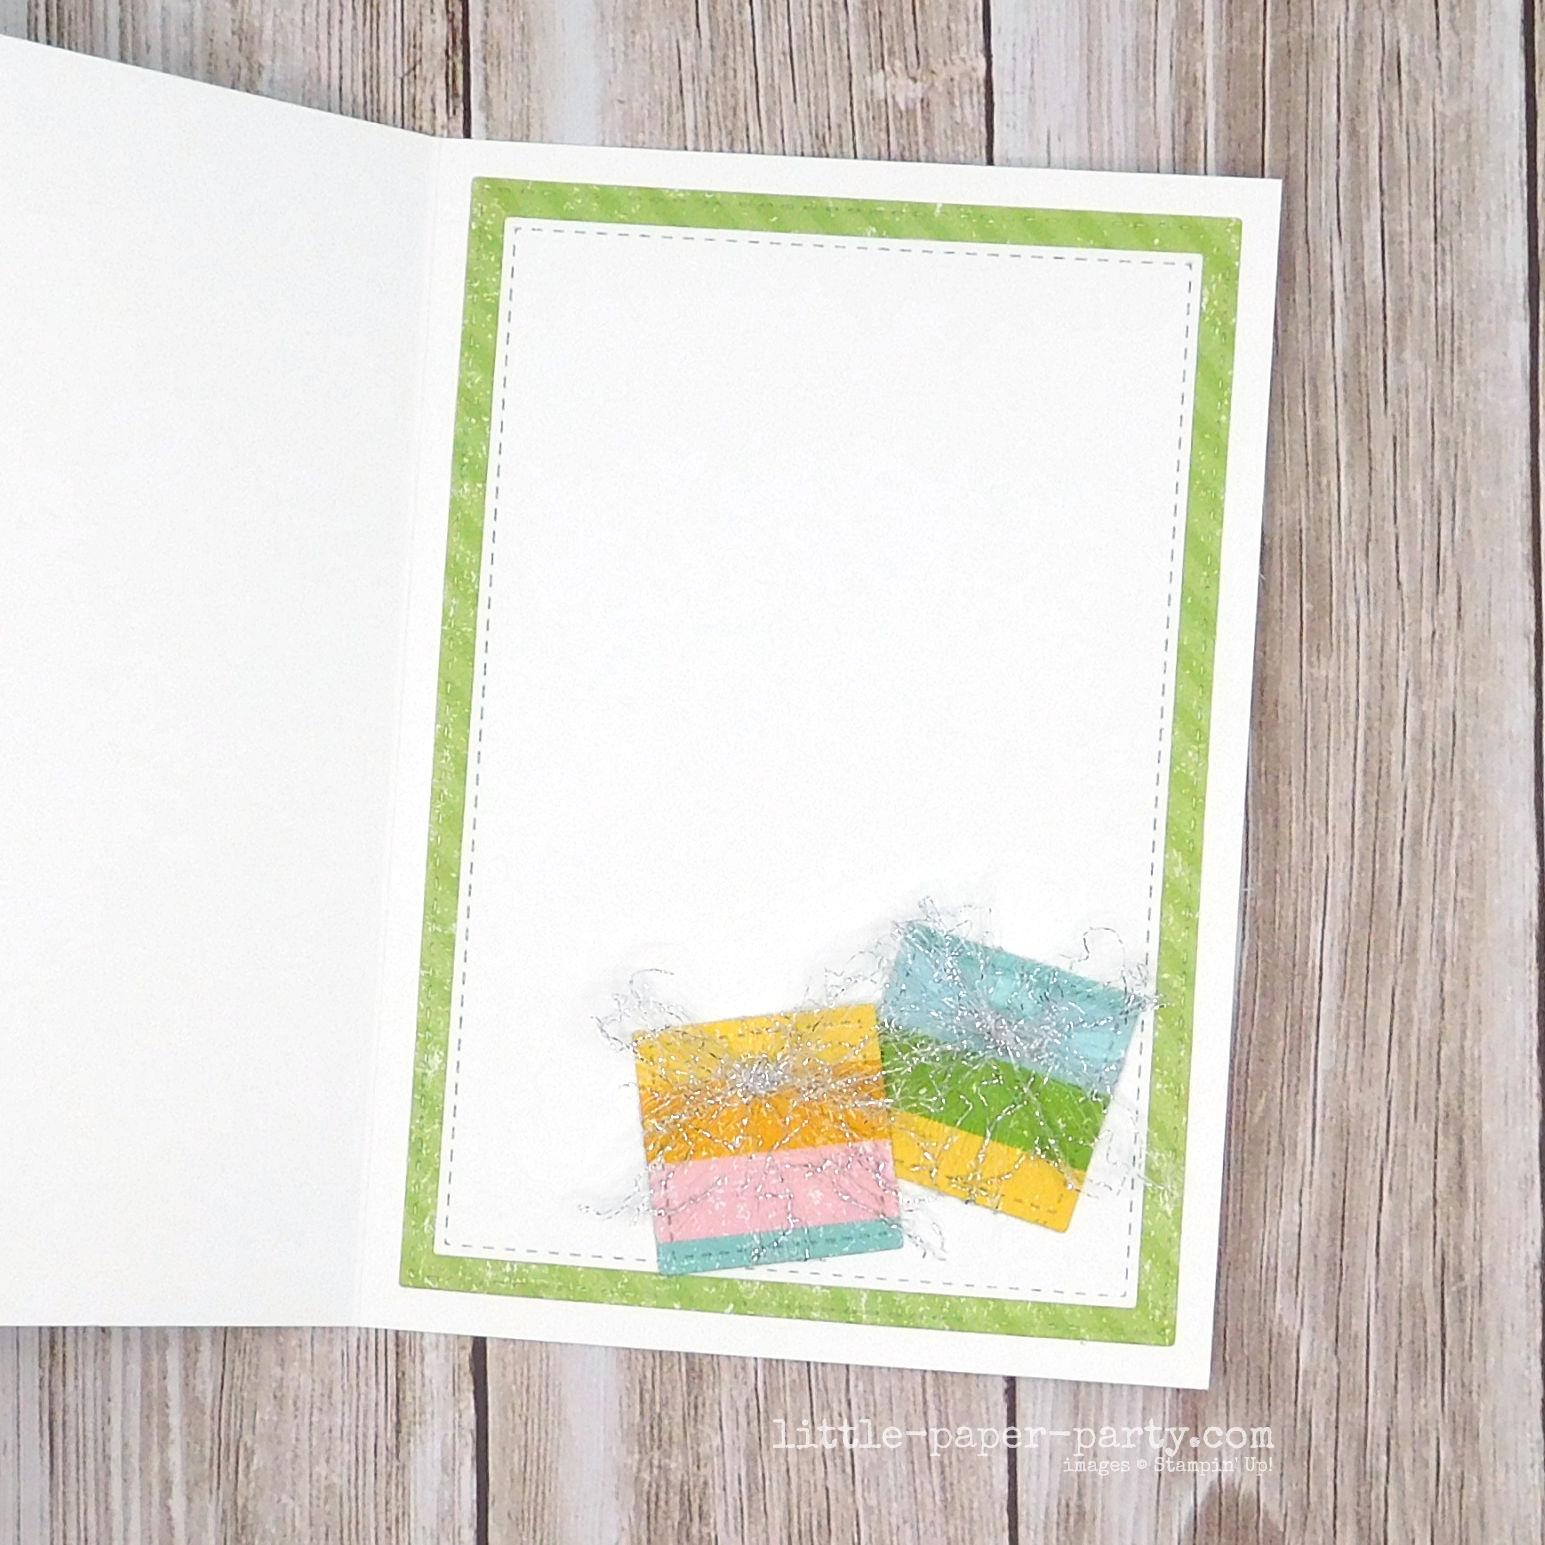 Little Paper Party, Playful Alphabet, Stitched Shapes Dies, 5